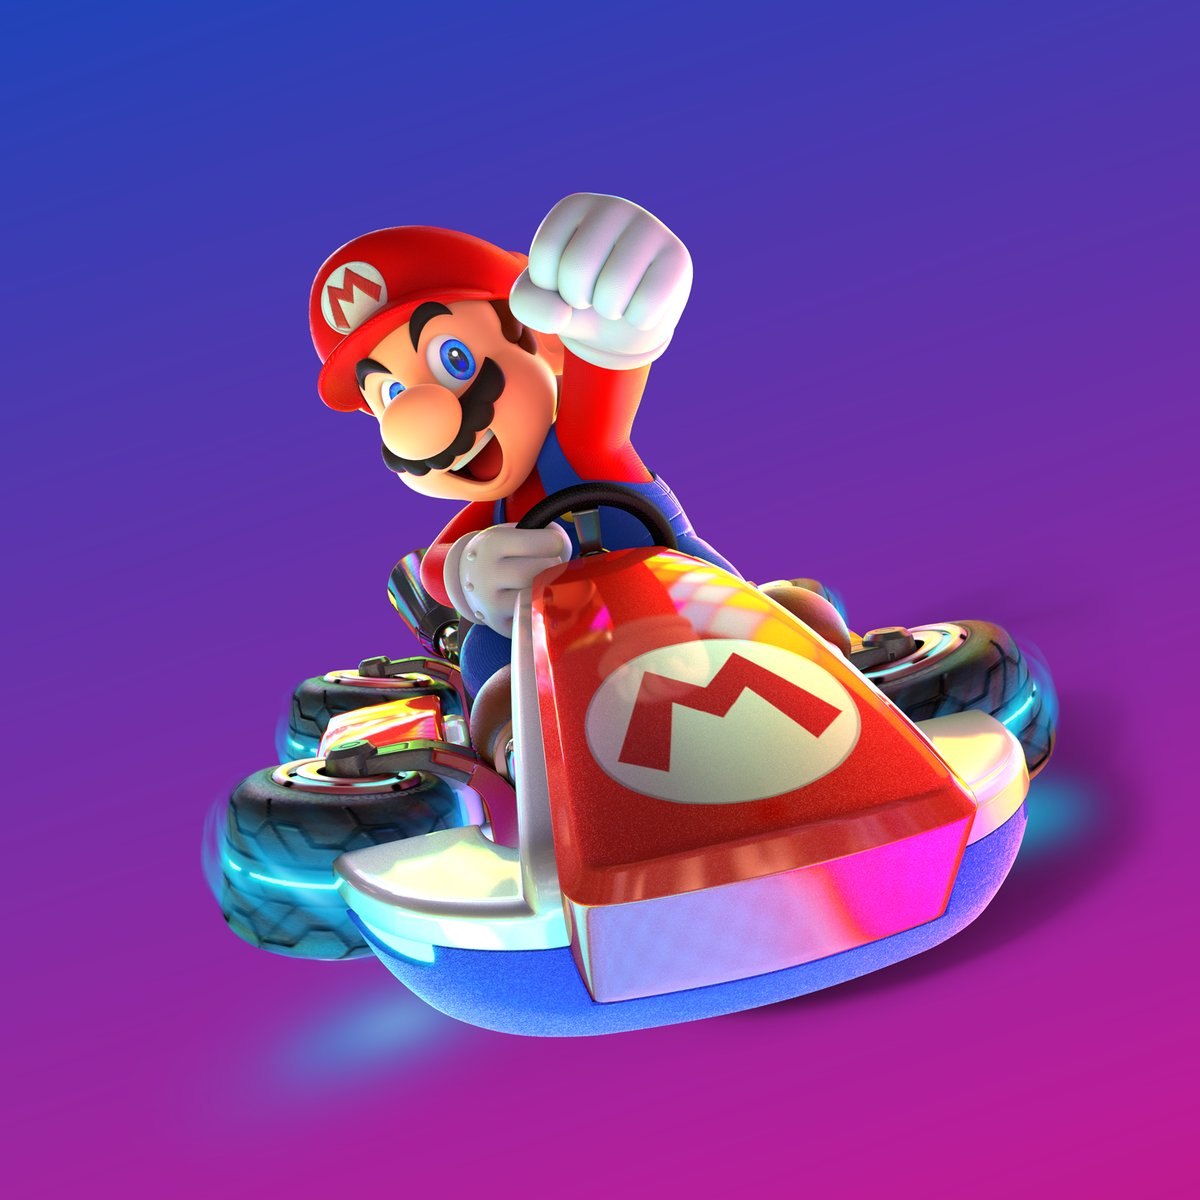 Mario Kart Delux-Nintendo-01